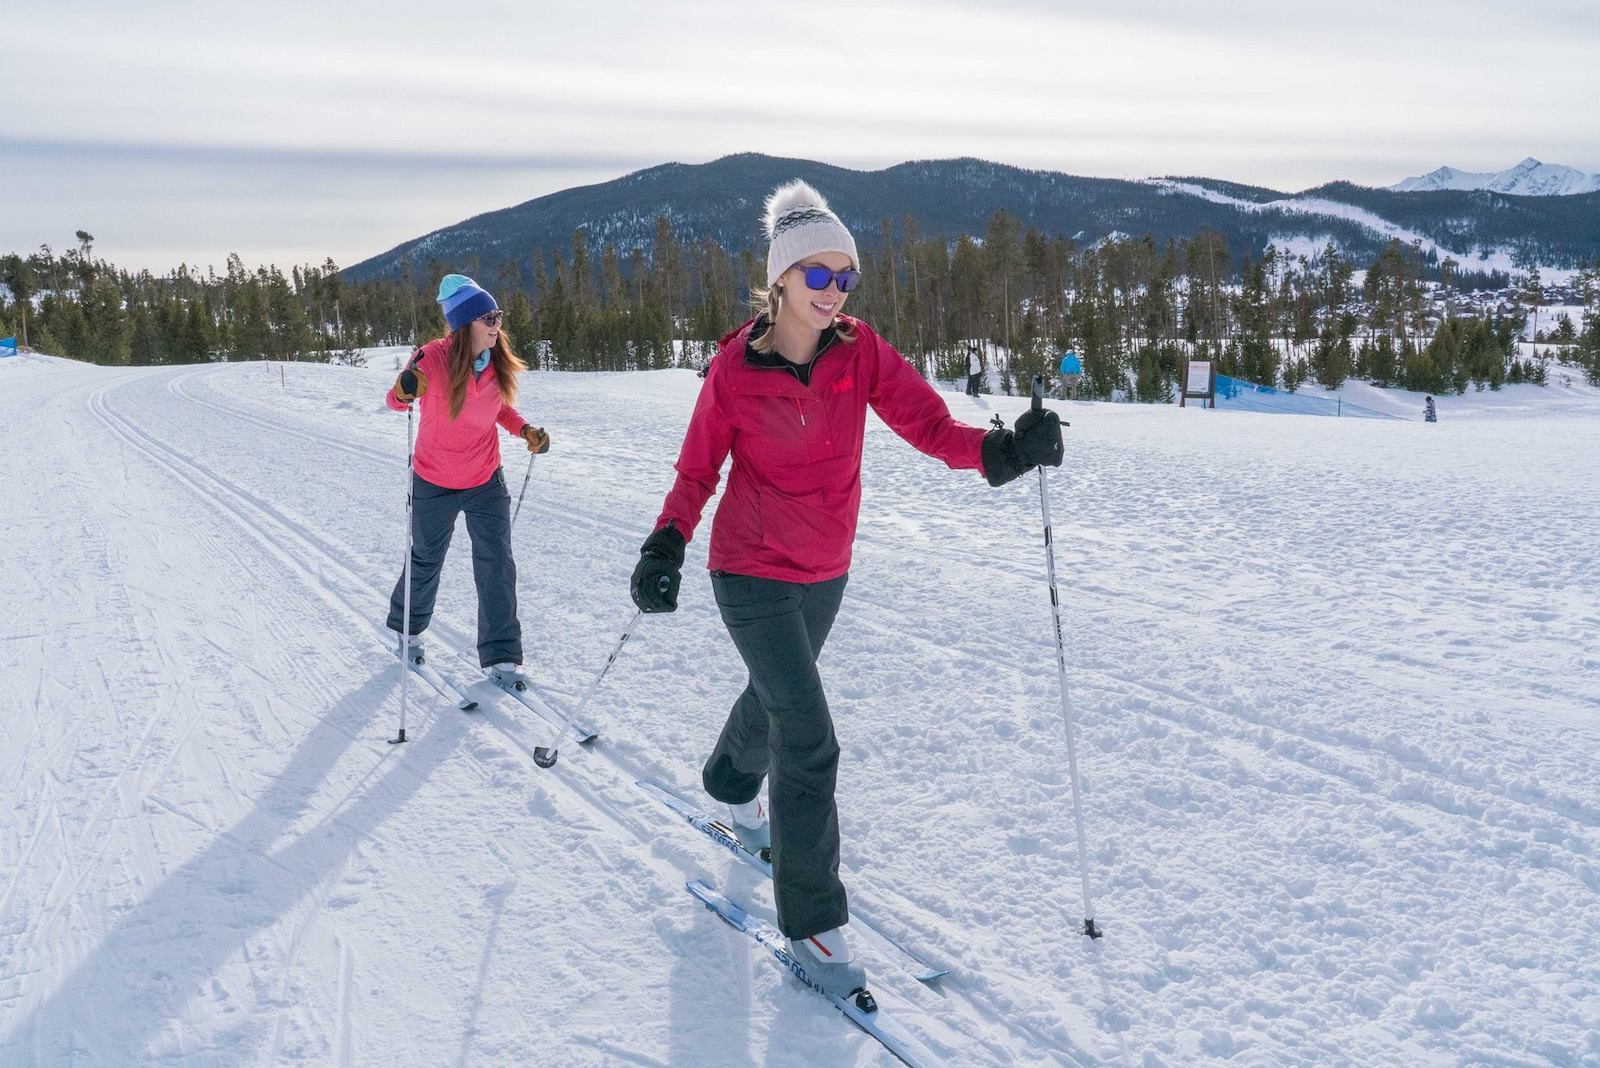 Cross country skiing at Keystone resort, CO